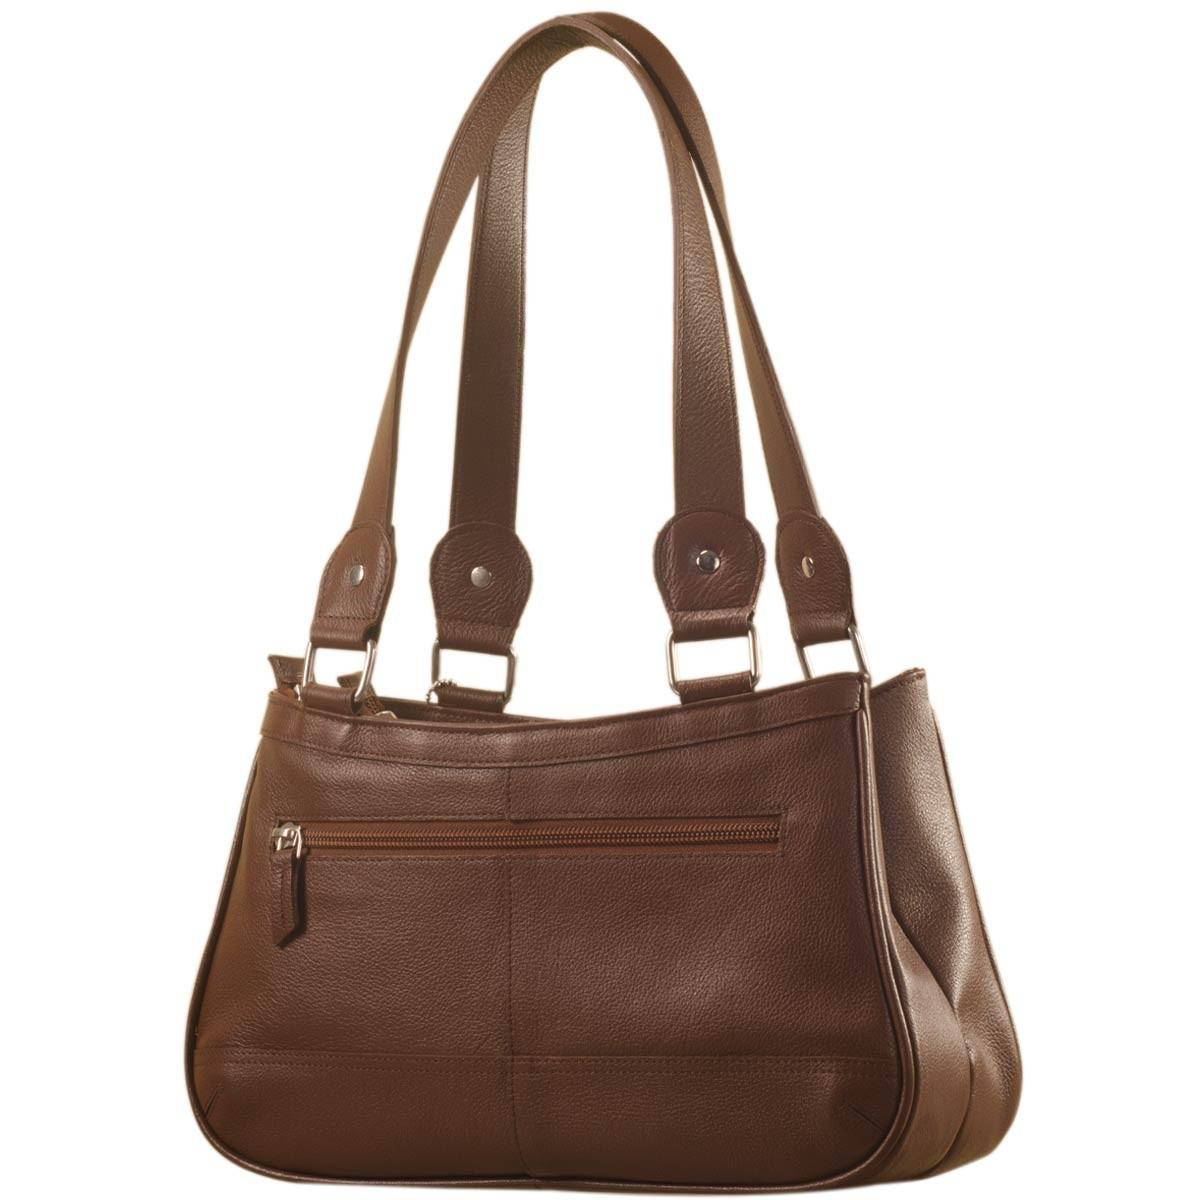 eZeeBags Maya Collection ladies handbags from eZeeBags – YA832v1 ... b81f7f0fa2